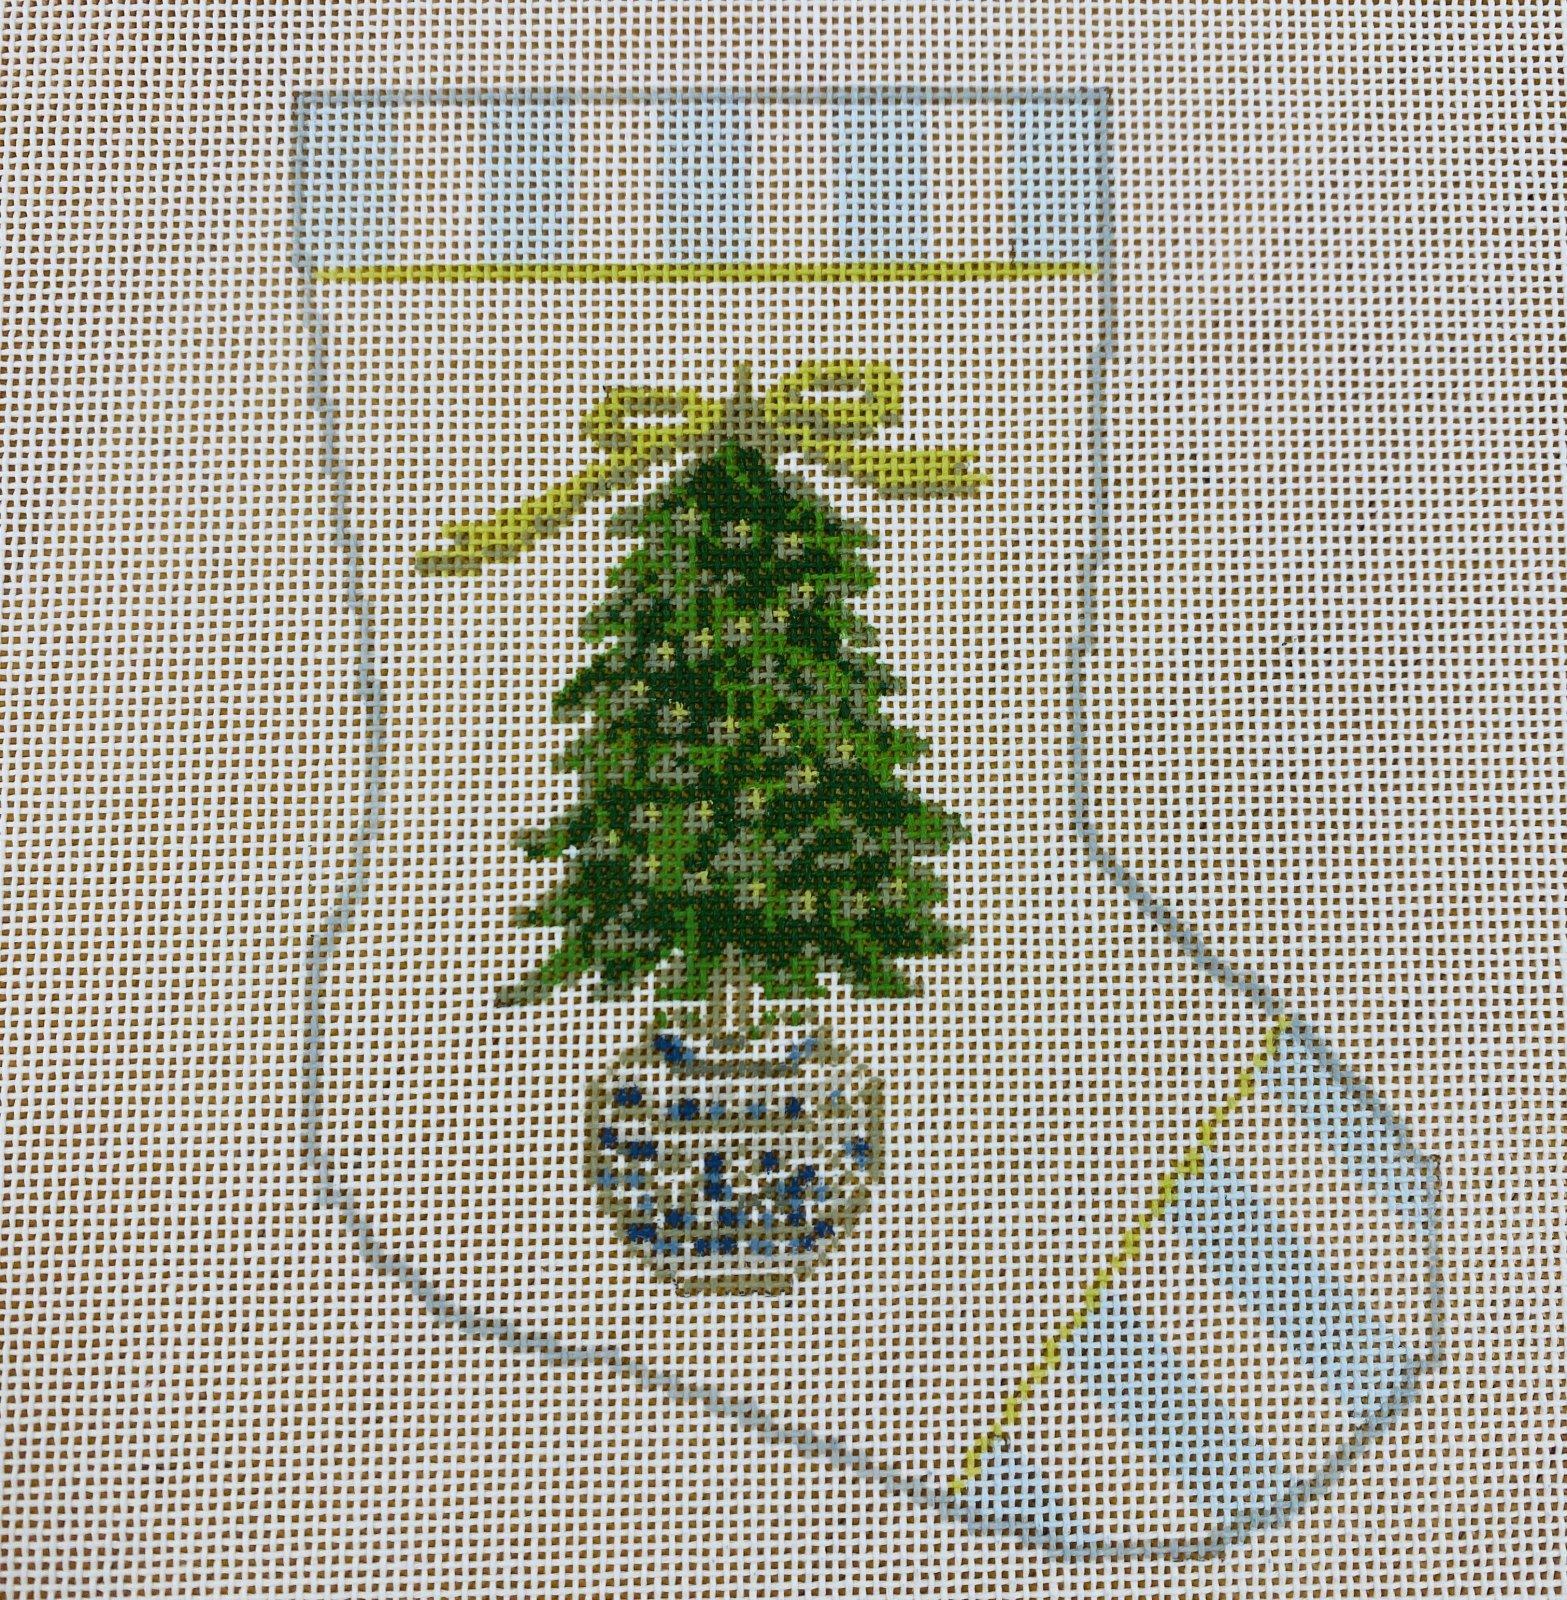 bauble stocking, trim the tree